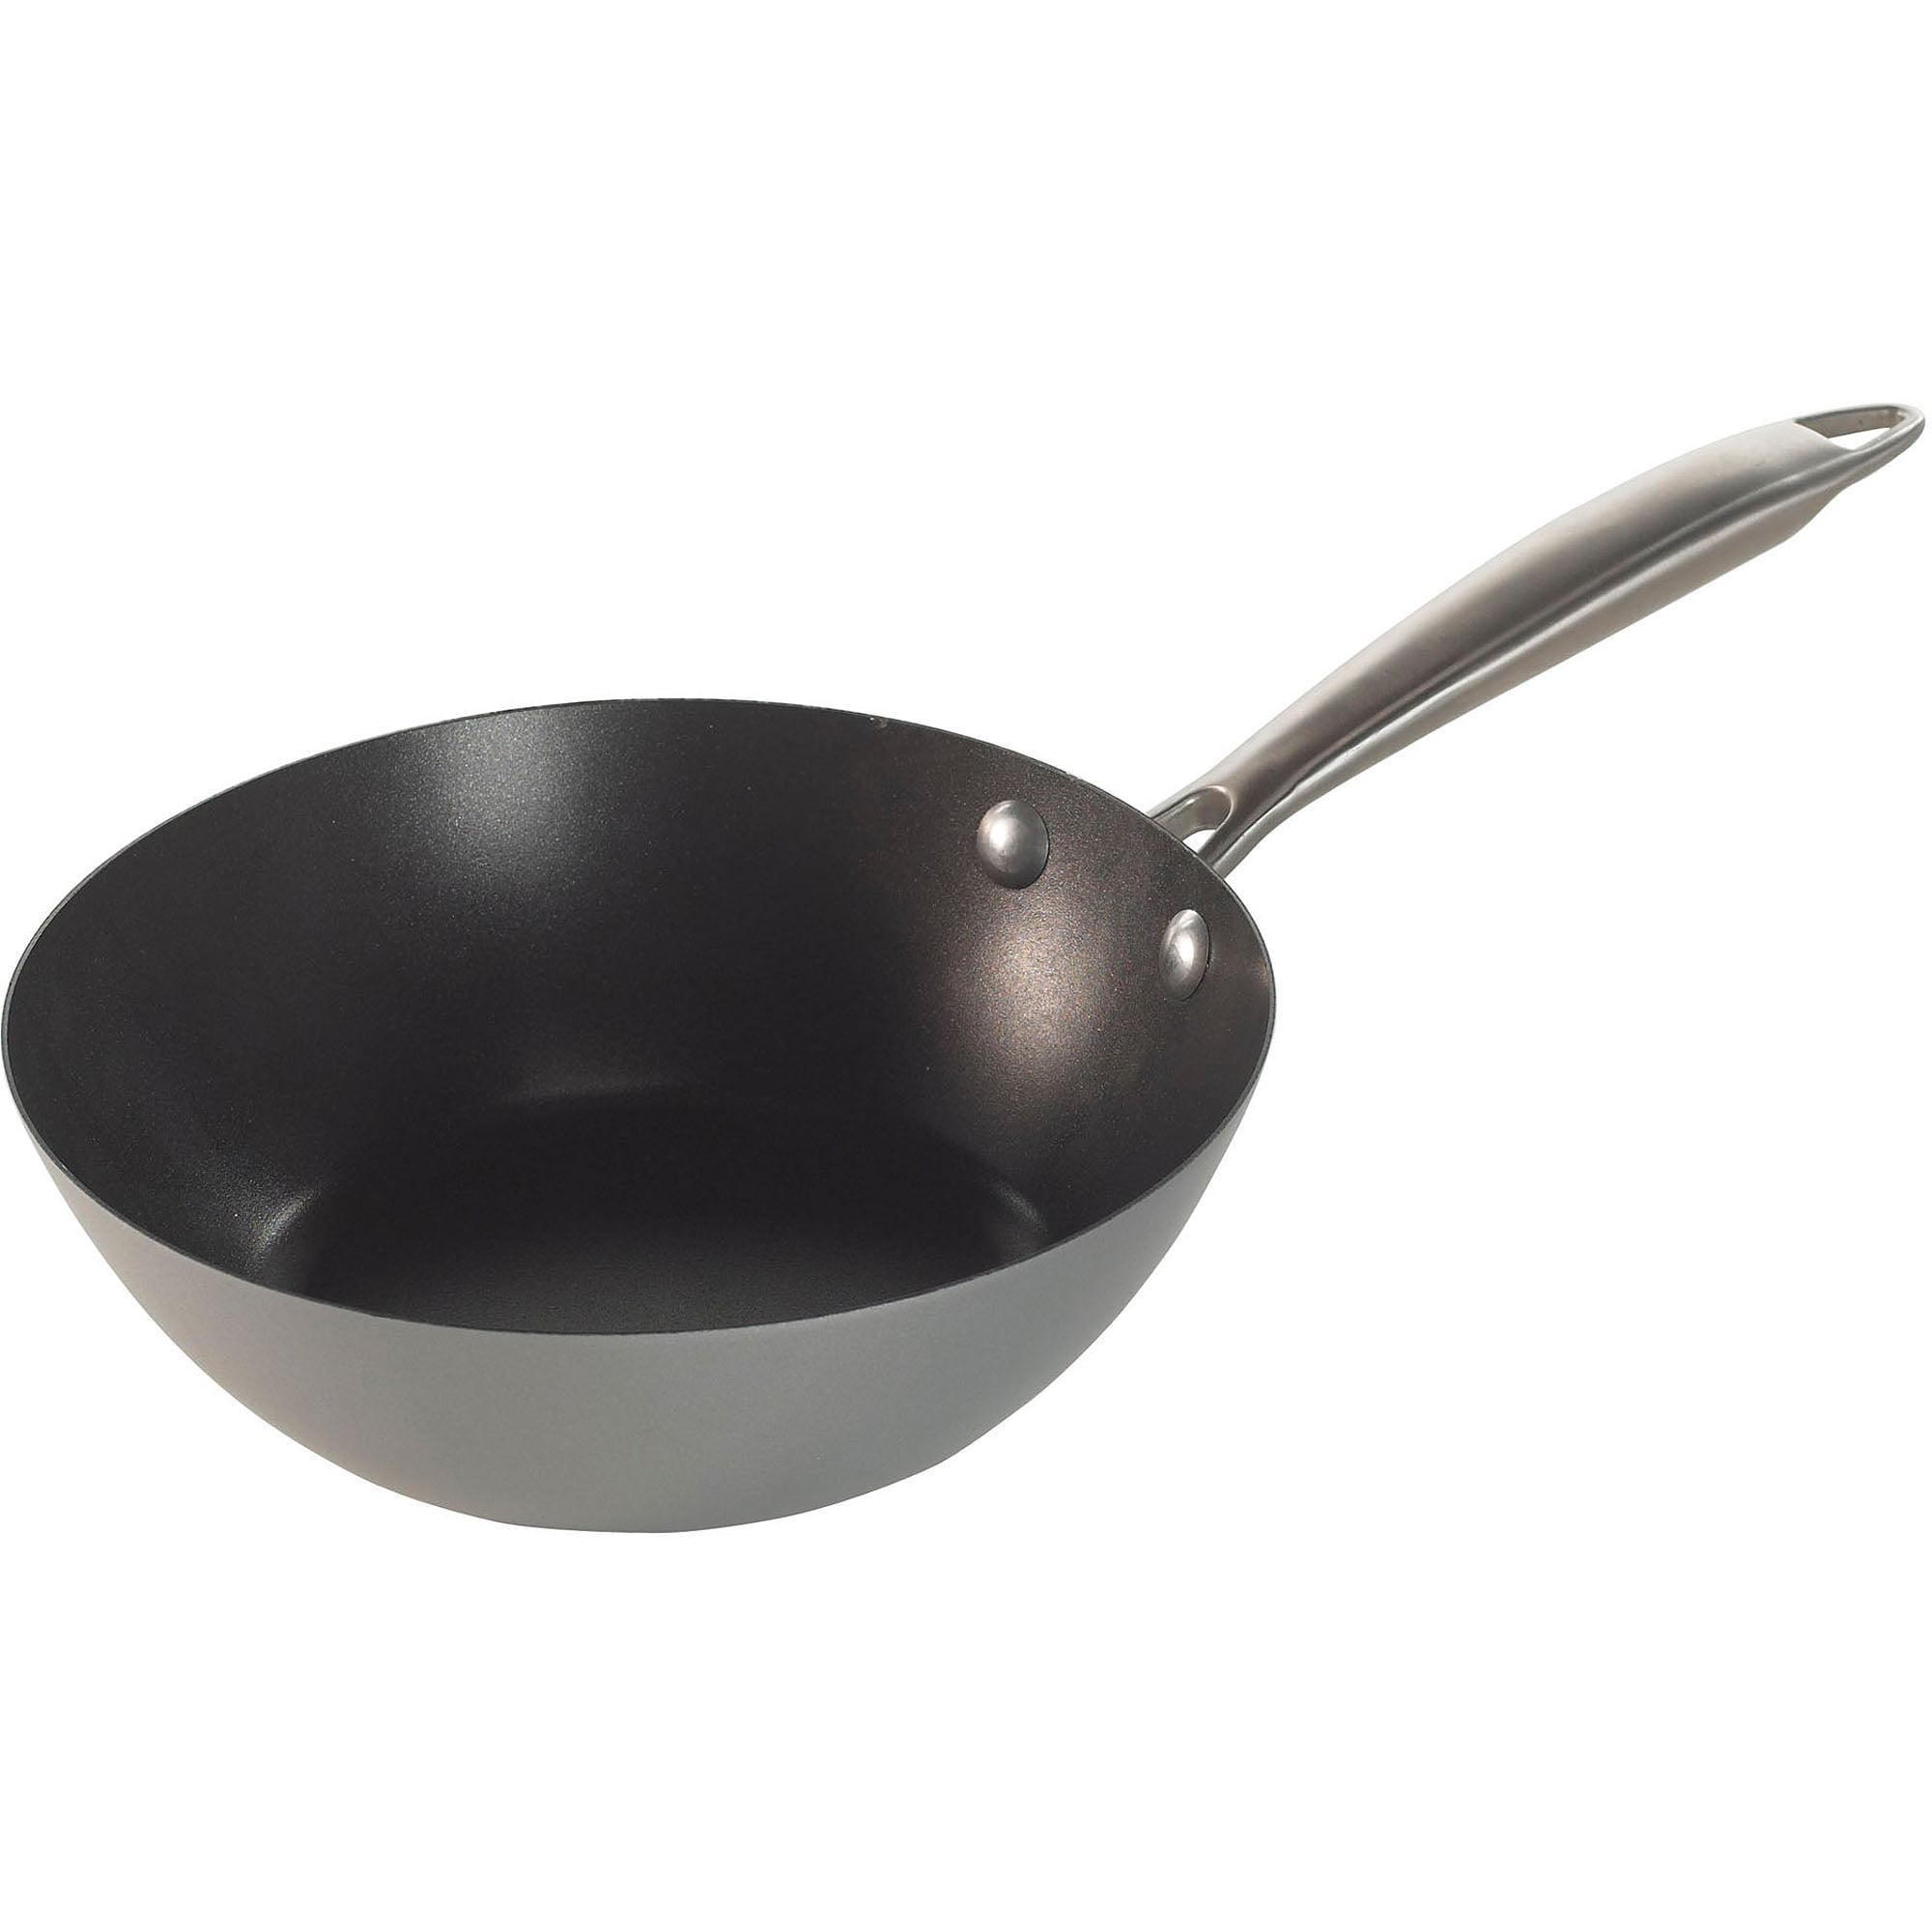 Nordic Ware Microwave Omelet Pan - Walmart.com